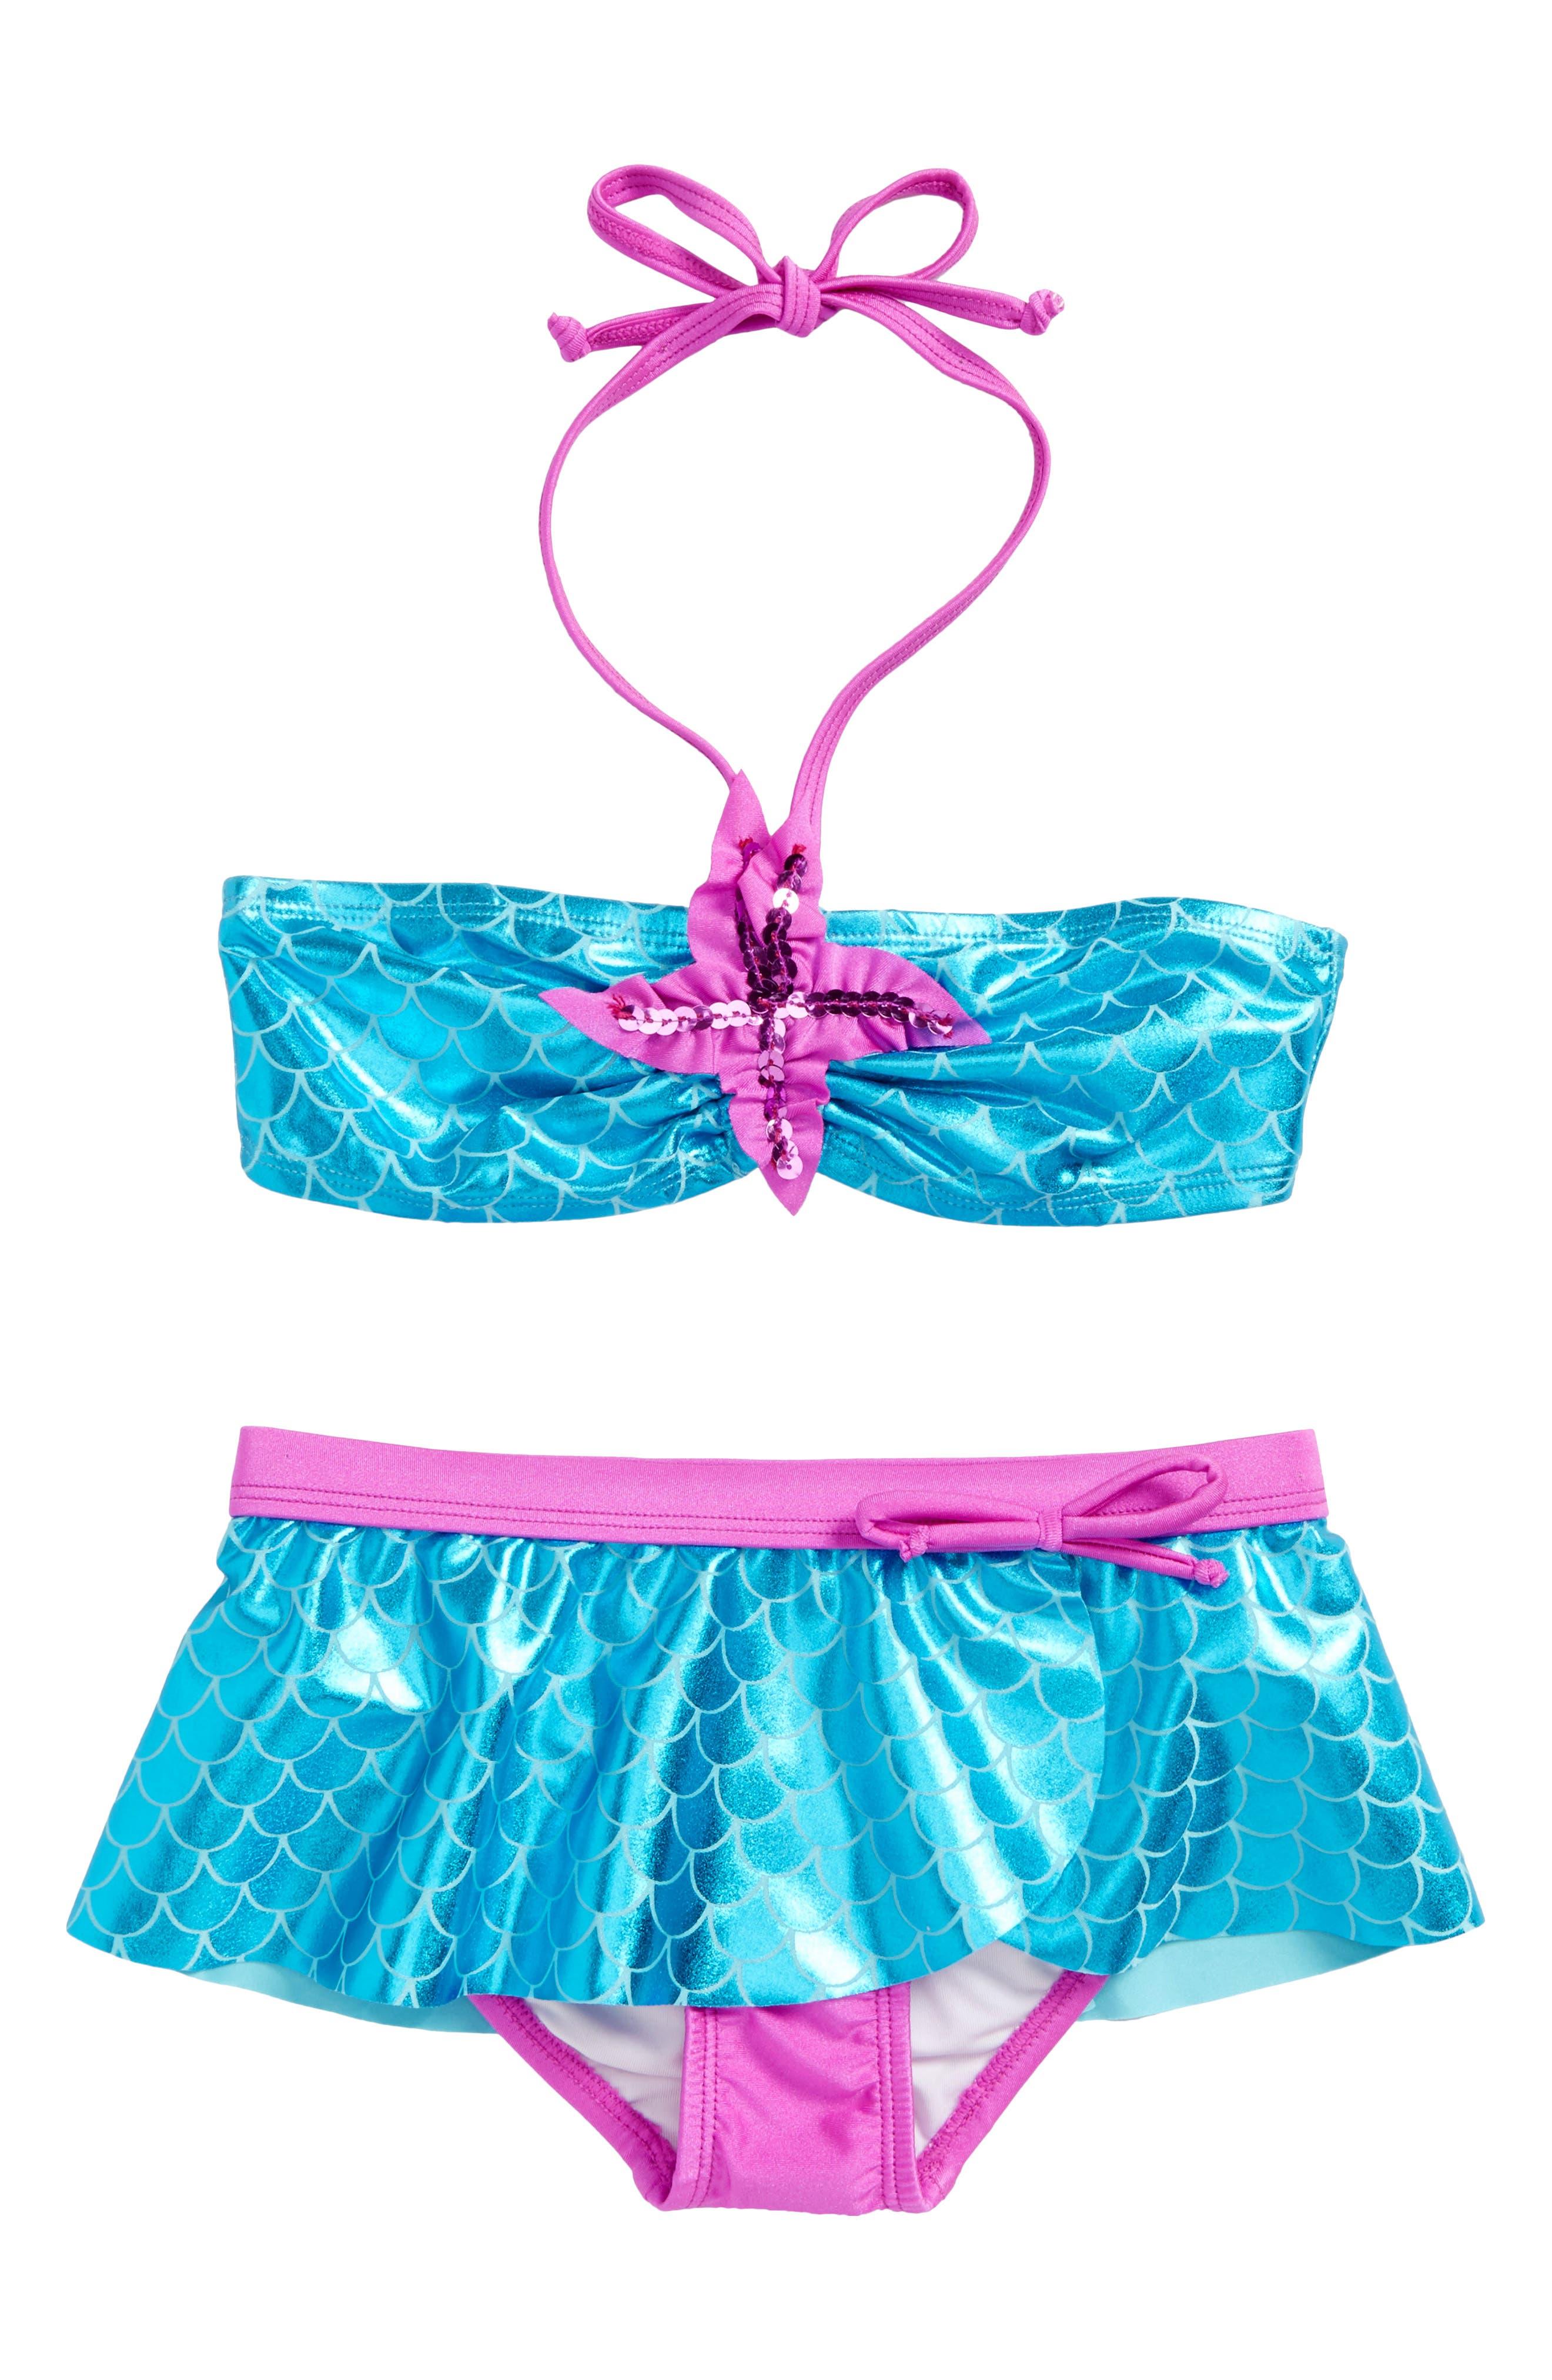 Mermaid Two-Piece Bikini Swimsuit,                         Main,                         color,